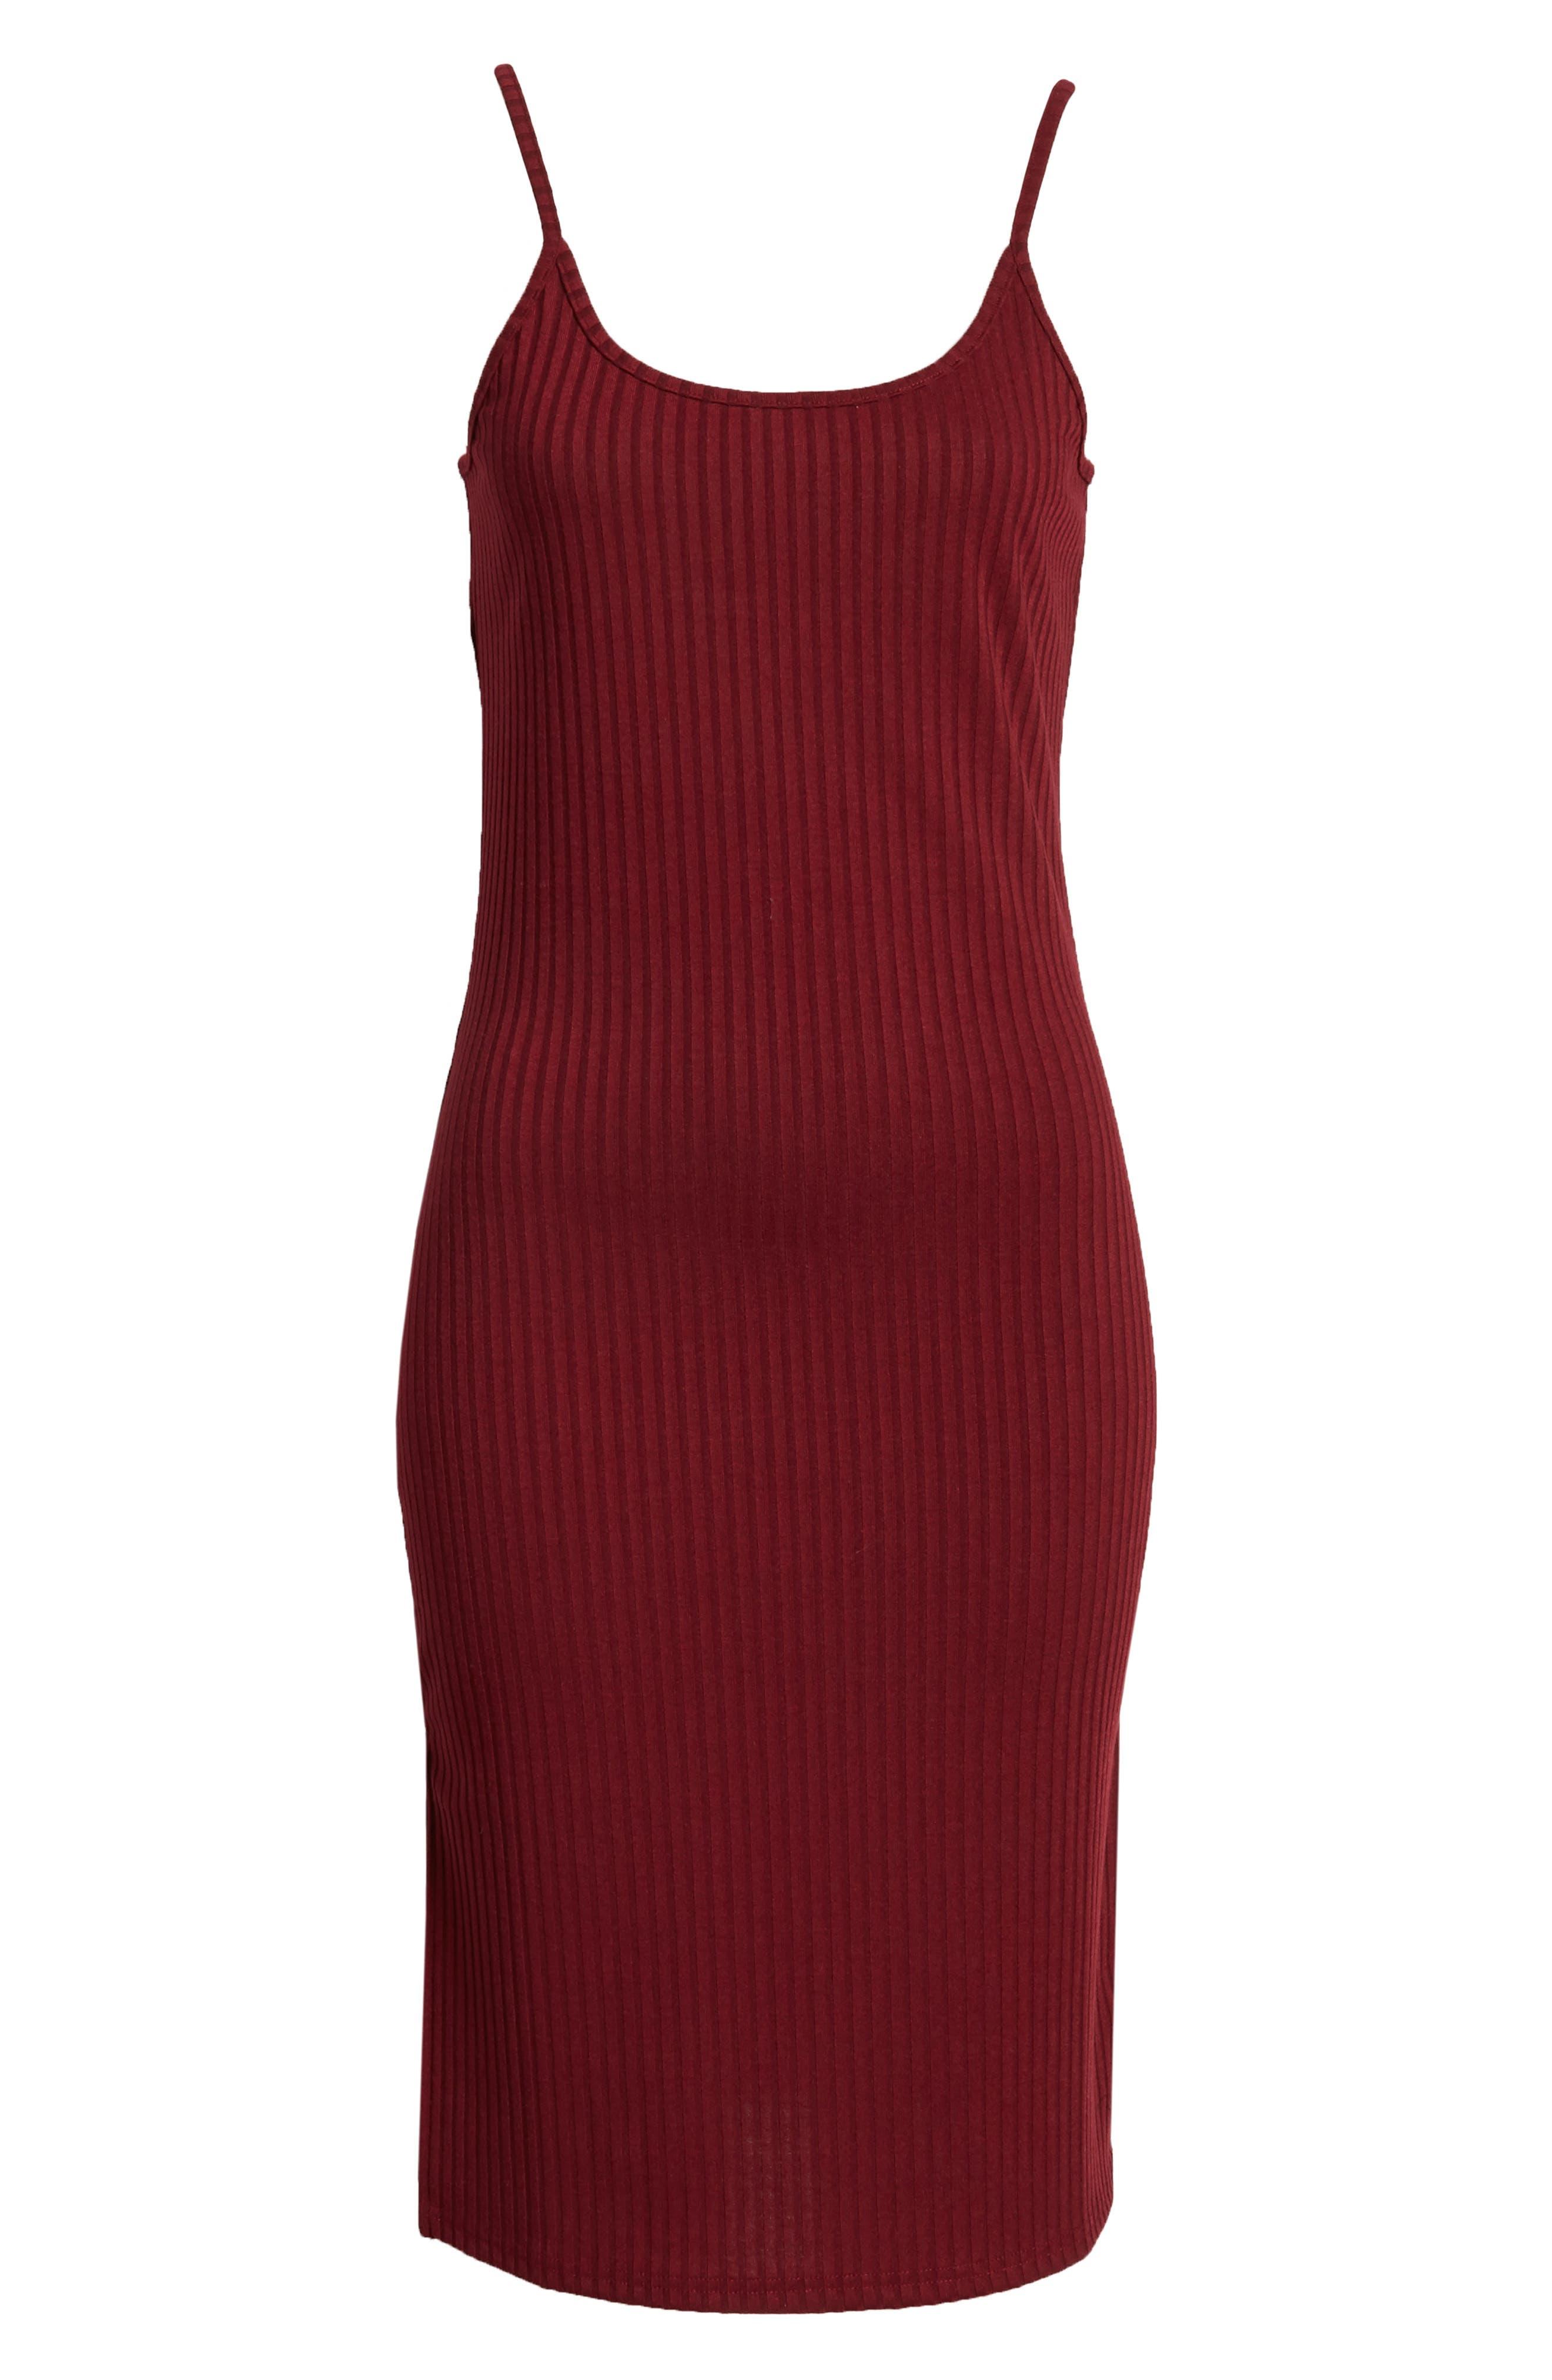 Hannah Dress,                             Alternate thumbnail 7, color,                             Wine